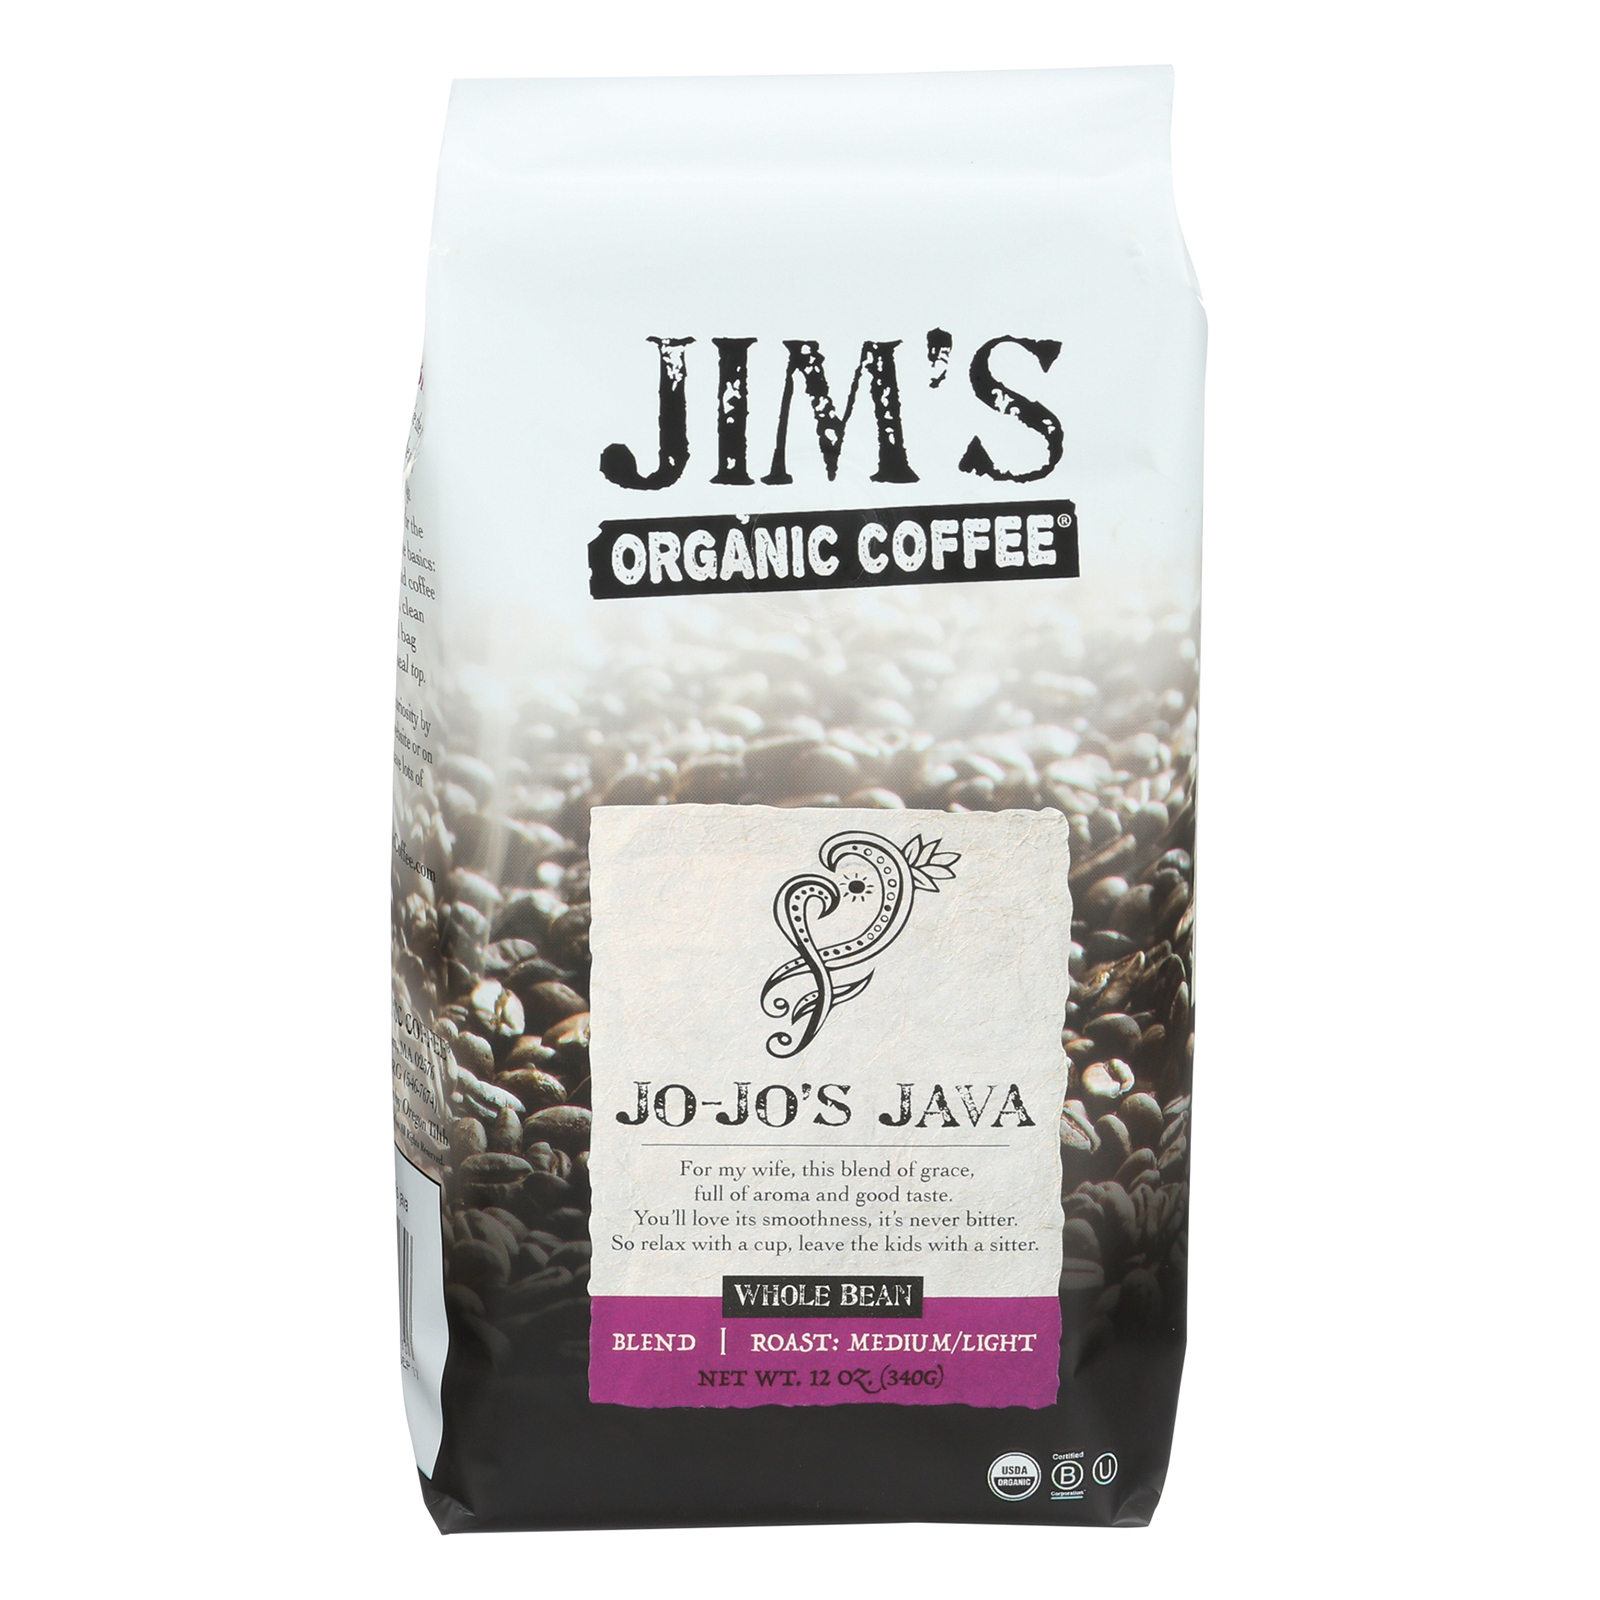 Jim's Organic Coffee - Whole Bean - Jo Jo's Java - Case of 6 - 12 oz.